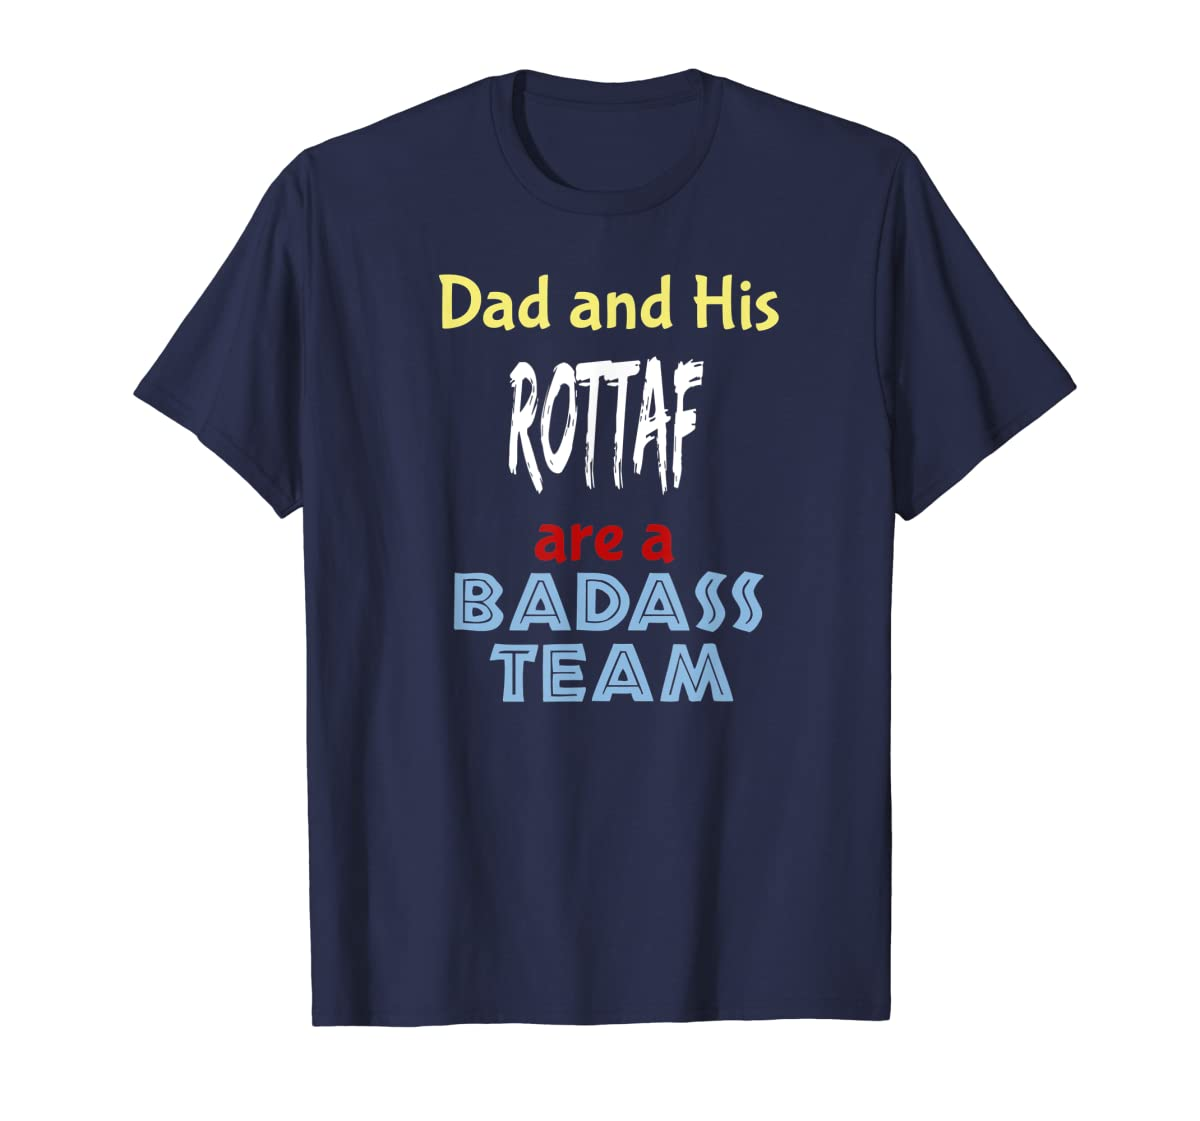 Mens Rottaf Dog Shirt Love Rottweiler + Afghan Hound =  T-Shirt-Men's T-Shirt-Navy